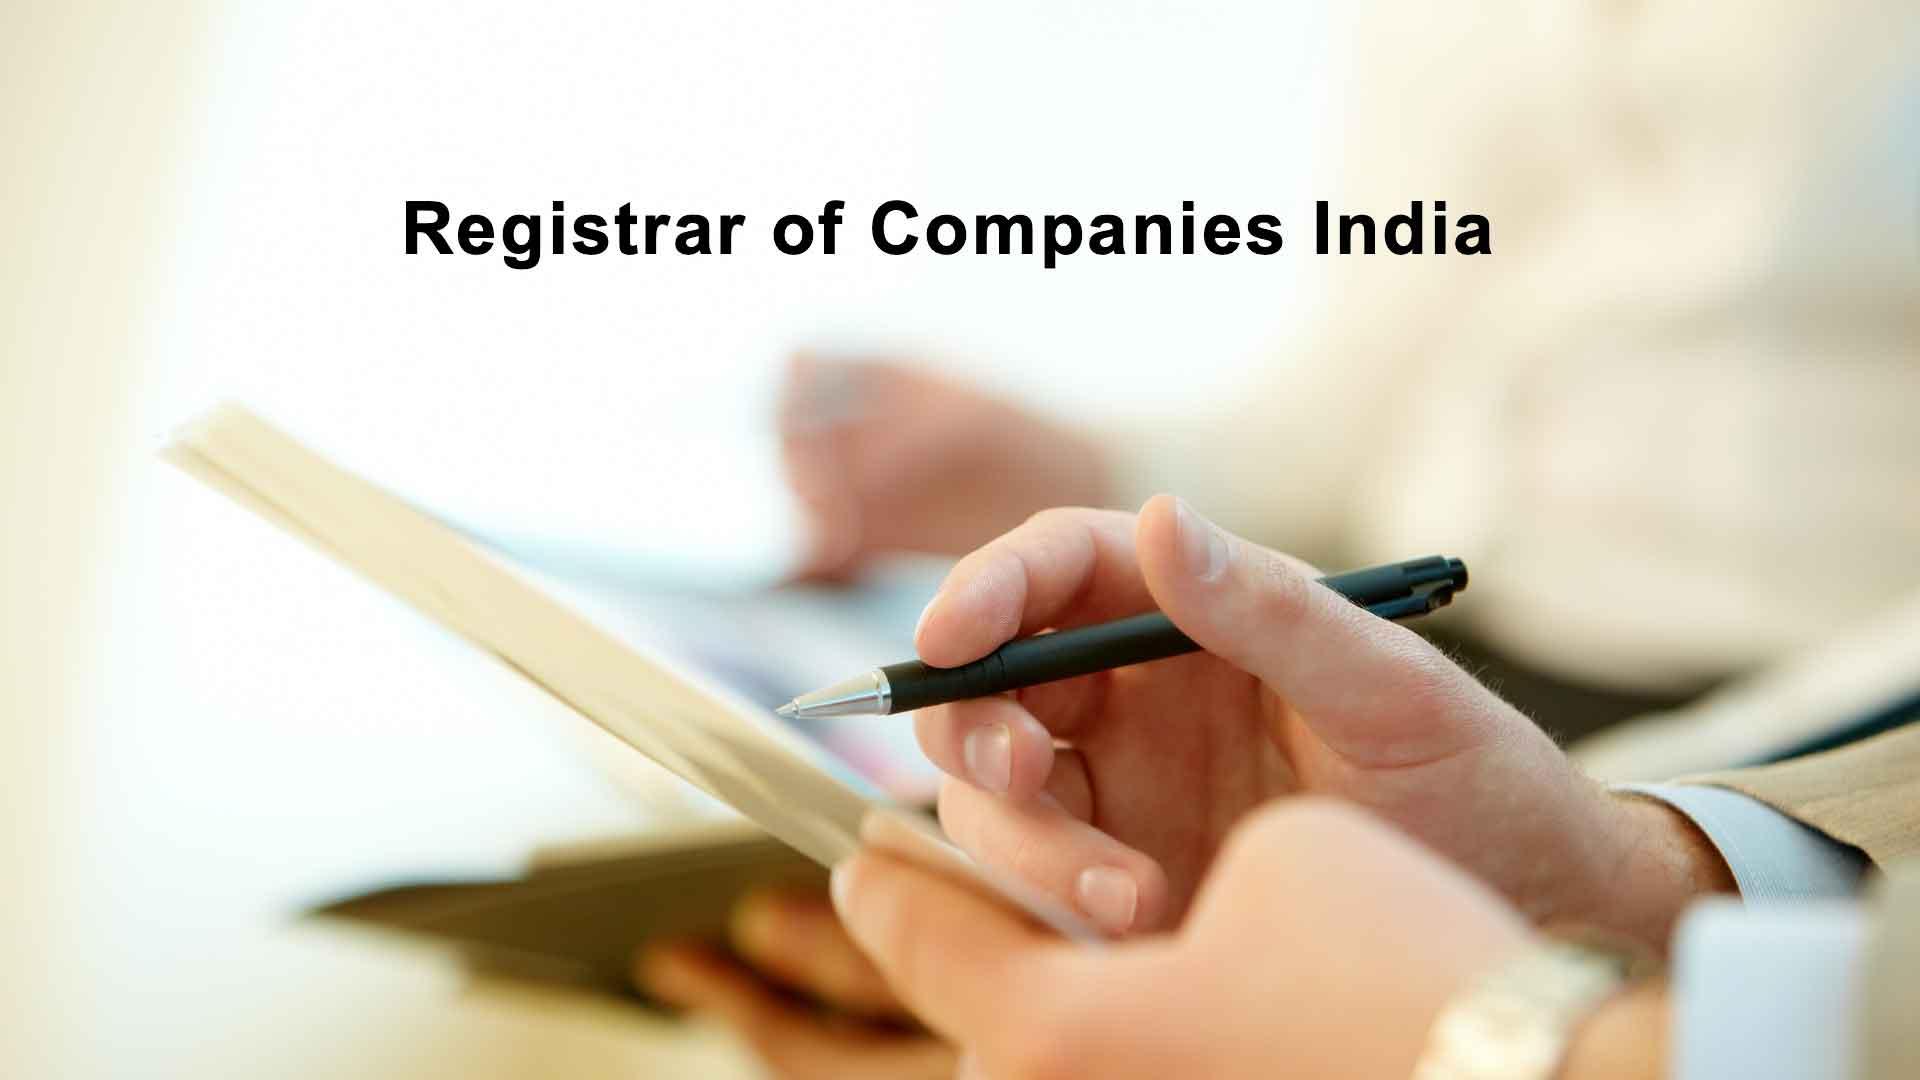 Registrar of Companies (ROC) Shillong Assam, Meghalaya, Manipura, Tripura, Mizoram, Nagaland and Arunachal Pradesh